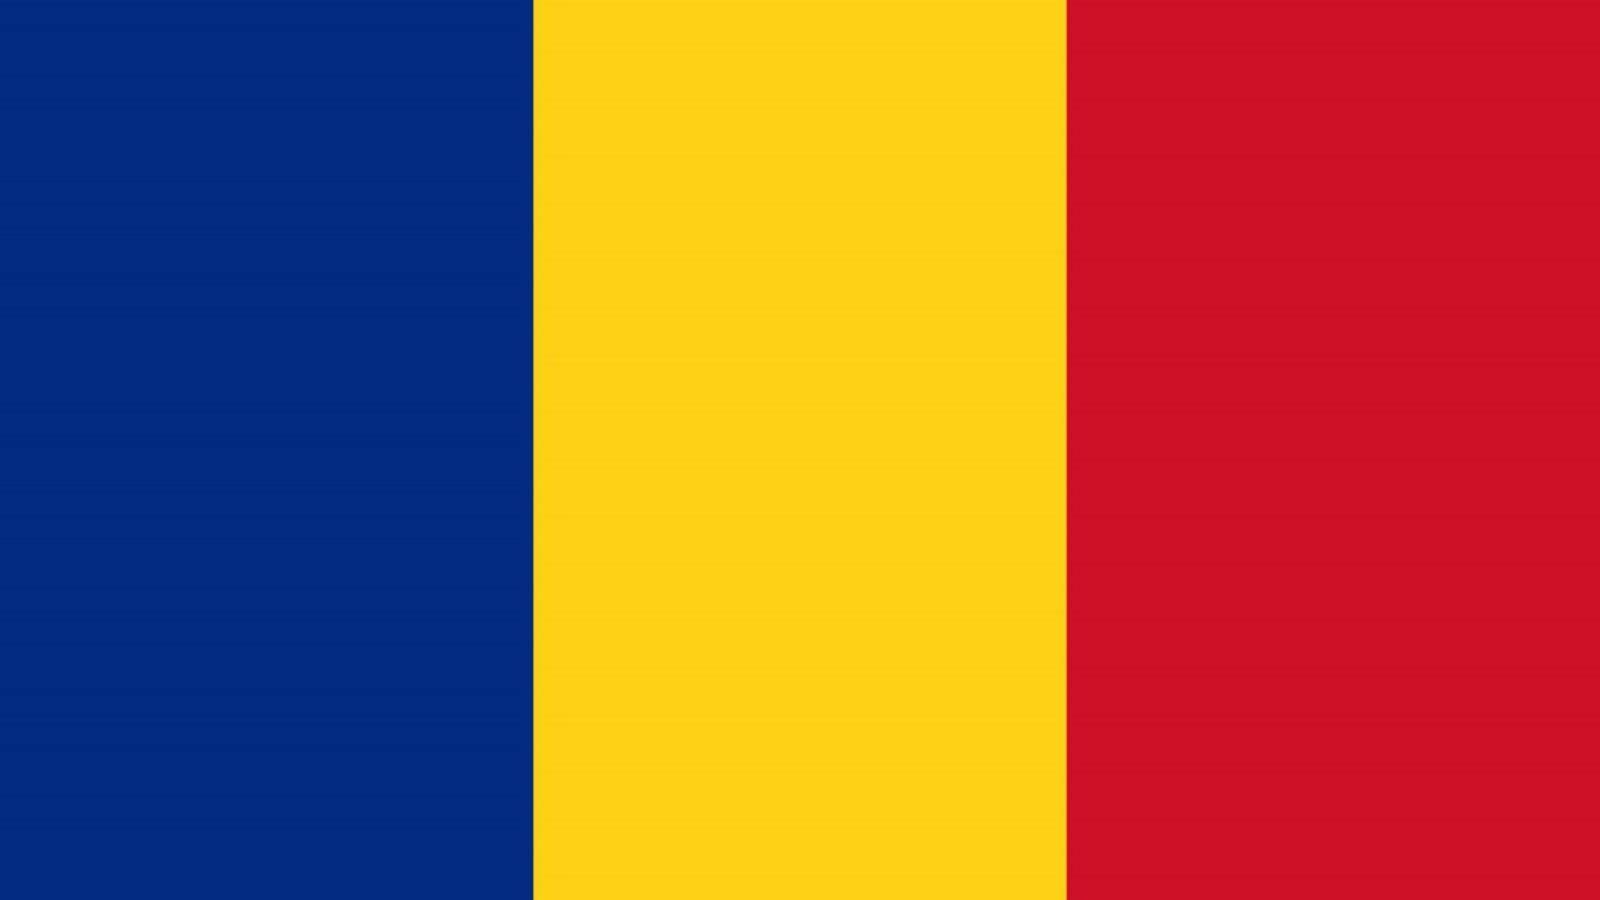 DSU precizari despre existenta noii tulpini Coronavirus Romania